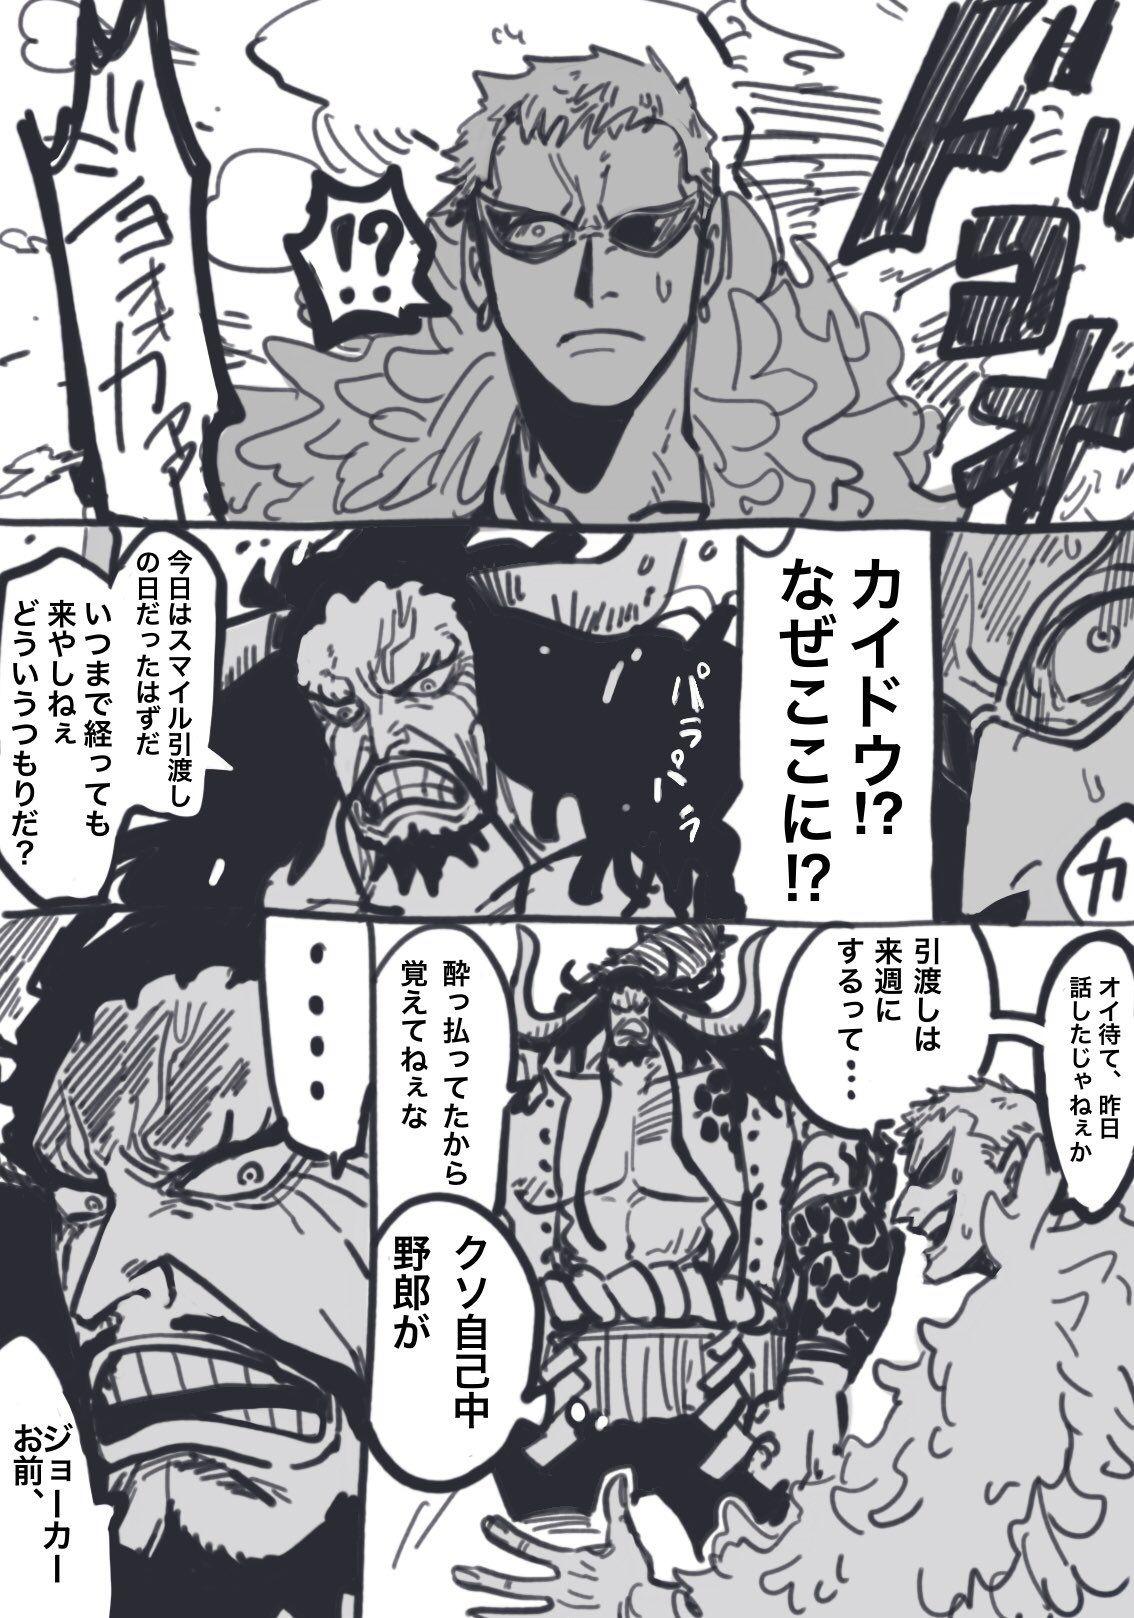 twitter セクシーな絵 漫画 onepiece イラスト